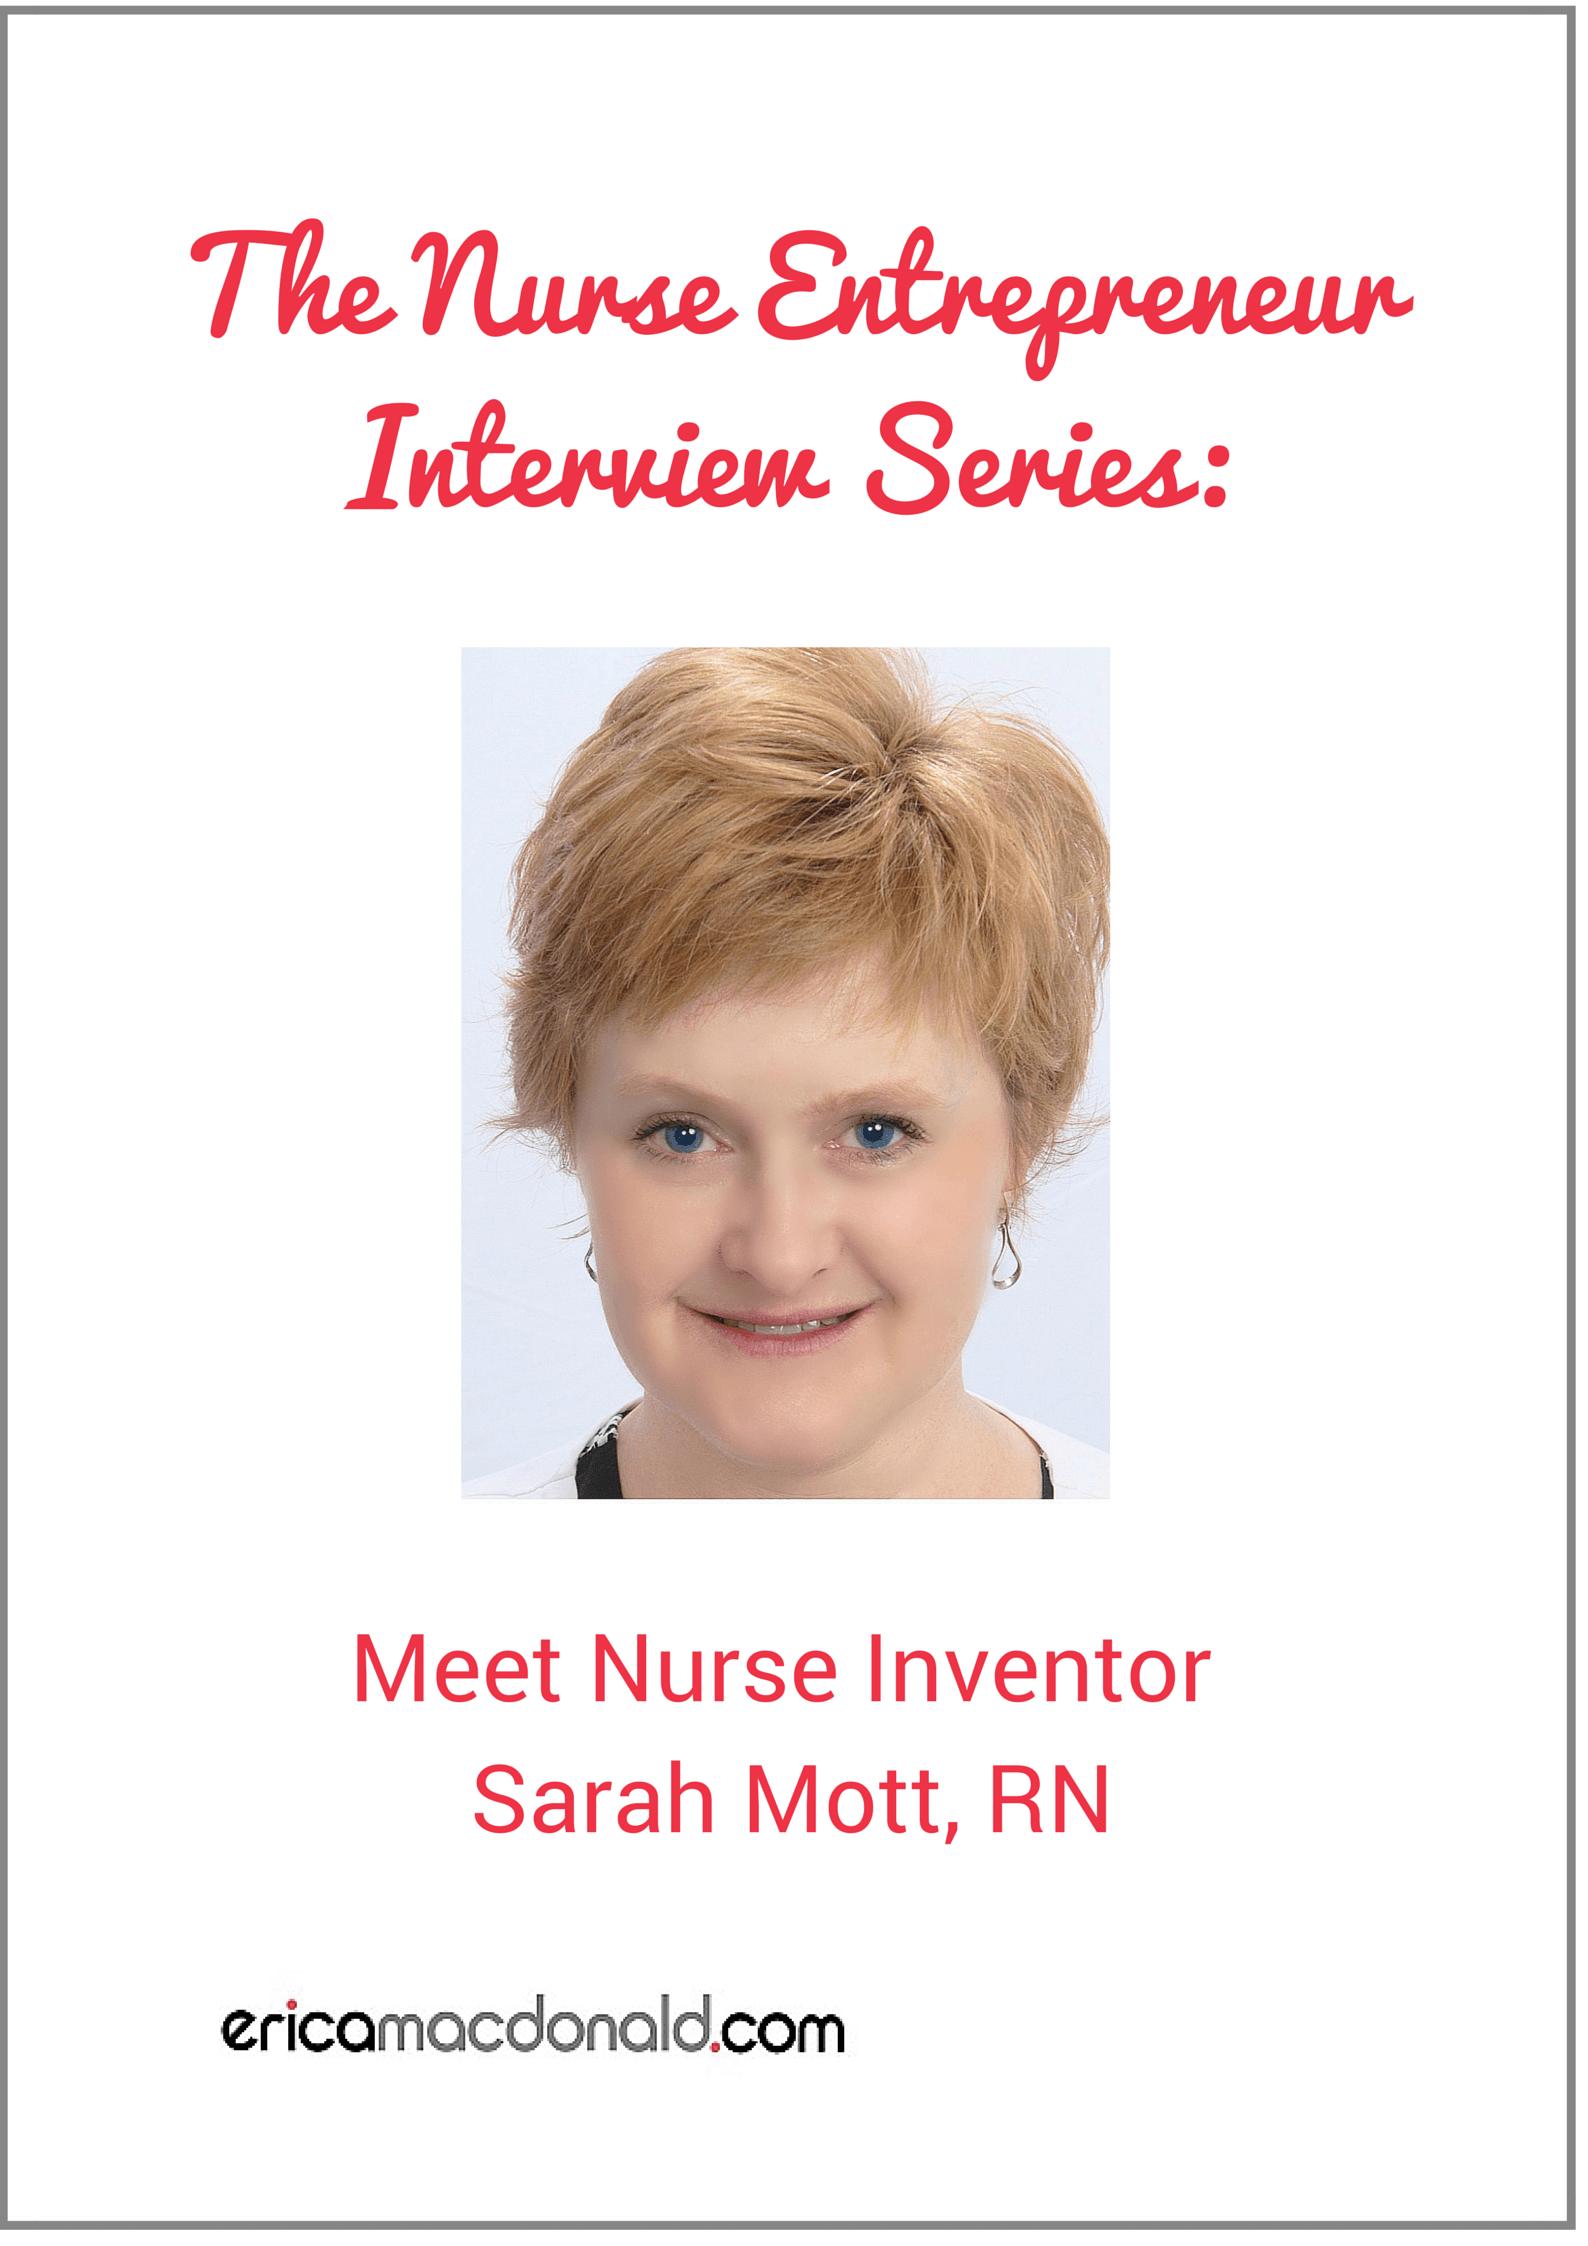 The Nurse Entrepreneur Series Meet Sarah Mott Rn Nurse Entrepreneur Nurse Entrepreneur